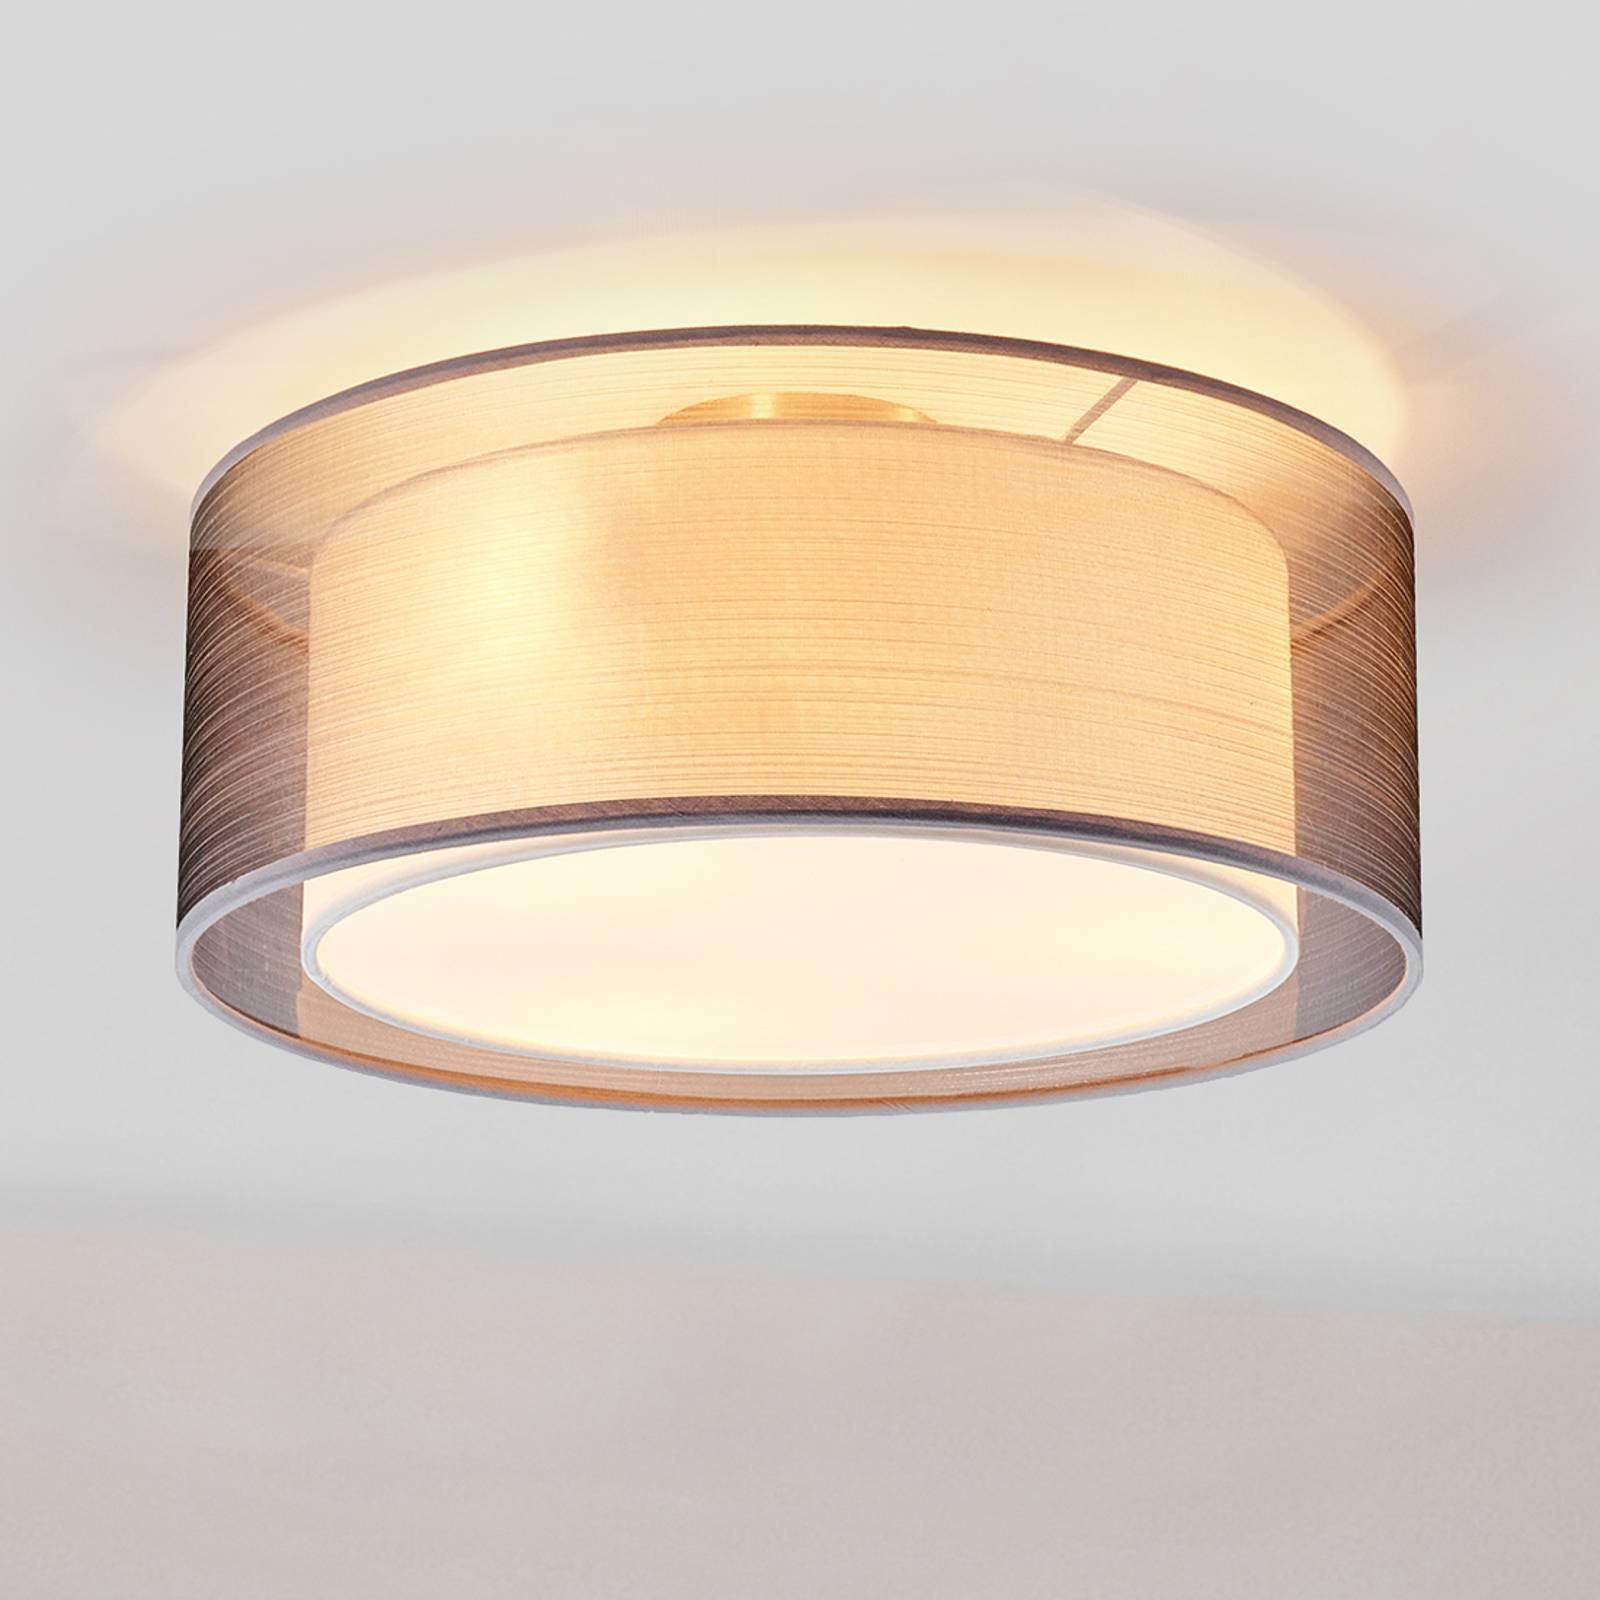 Stoffen plafondlamp Nica in grijs